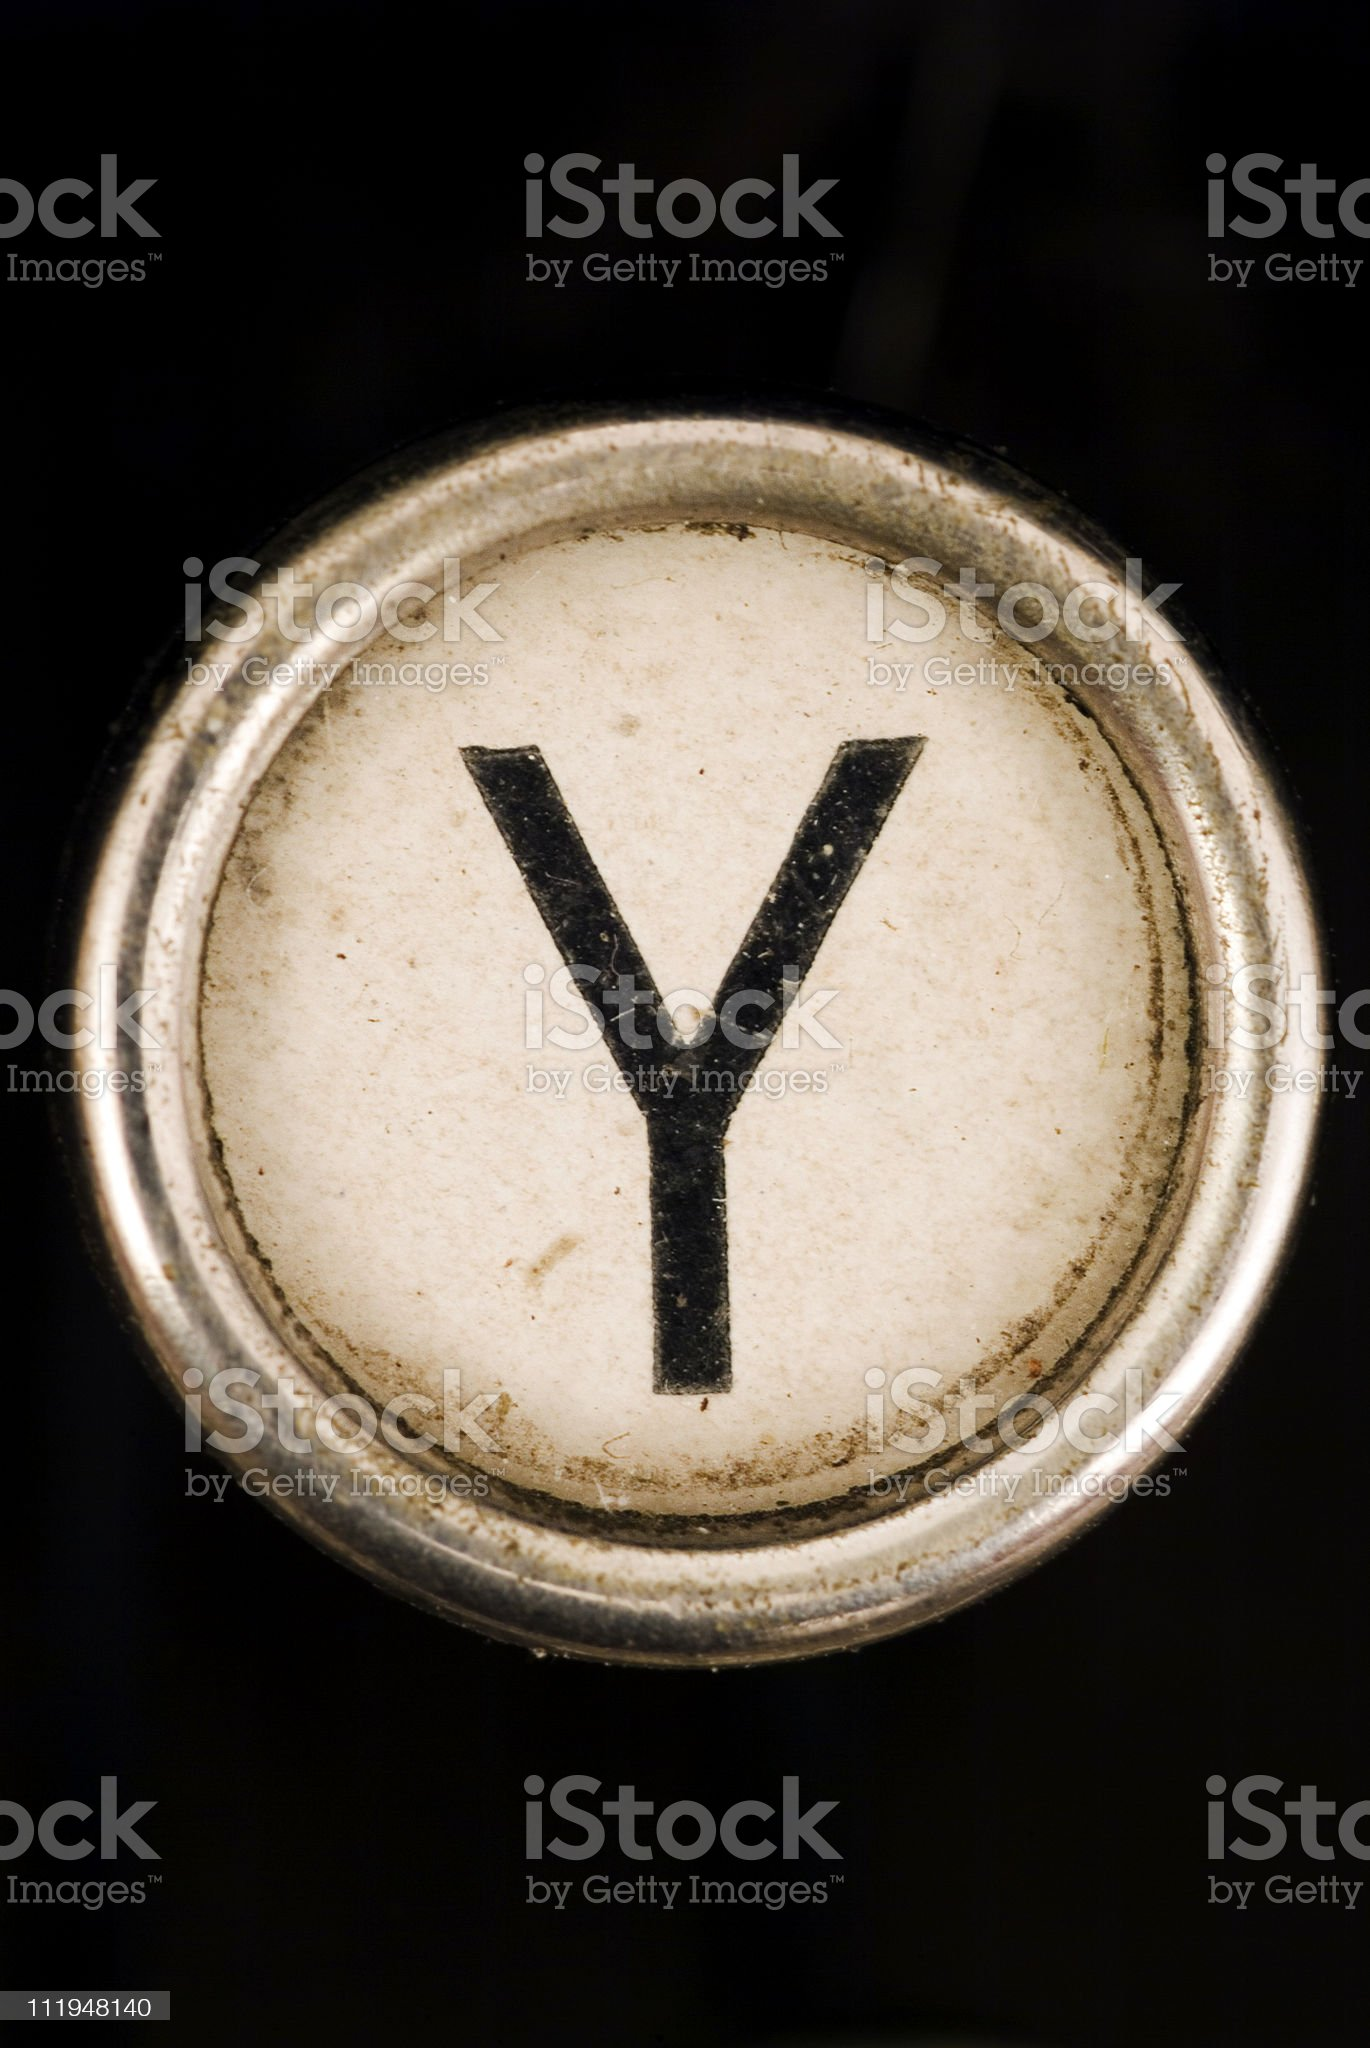 Y key of a full alphabet from grungey typewriter royalty-free stock photo